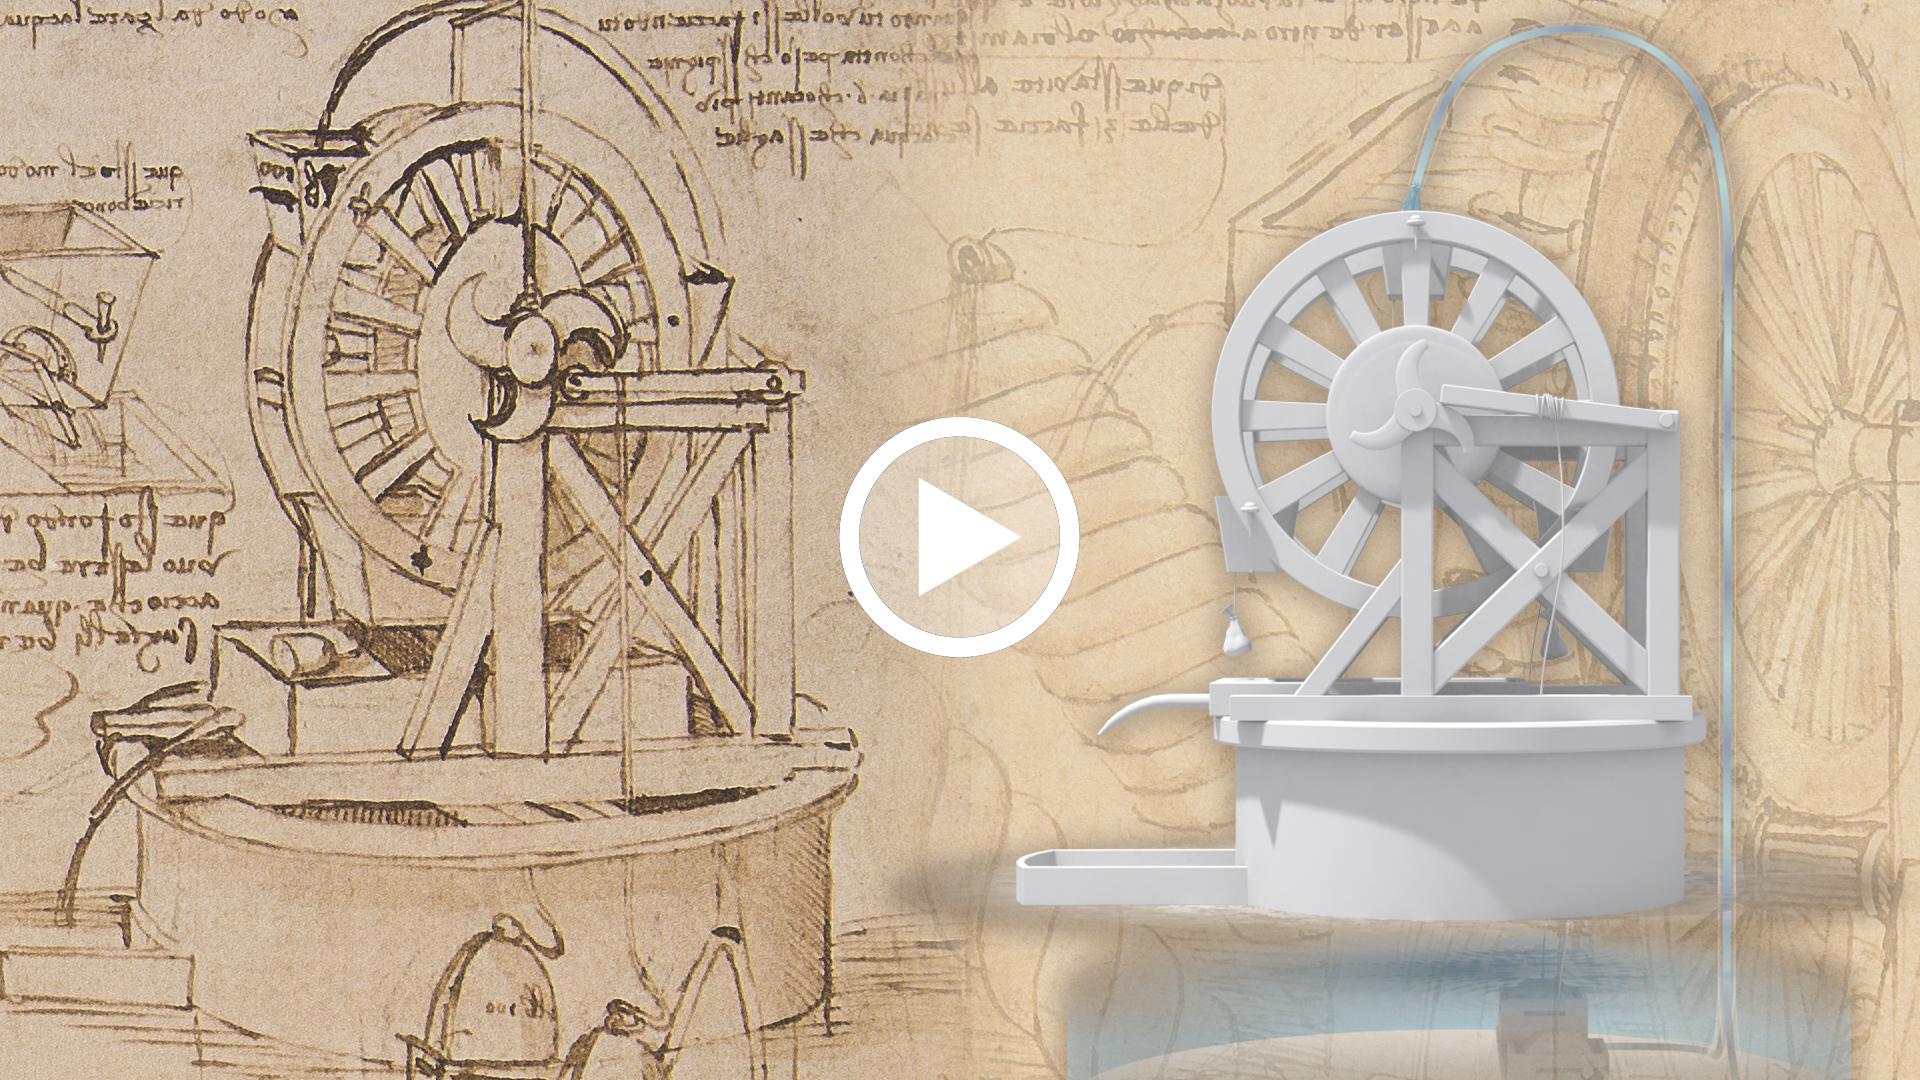 video Leonardo da Vinci, Perpetual motion pump, CA 26V